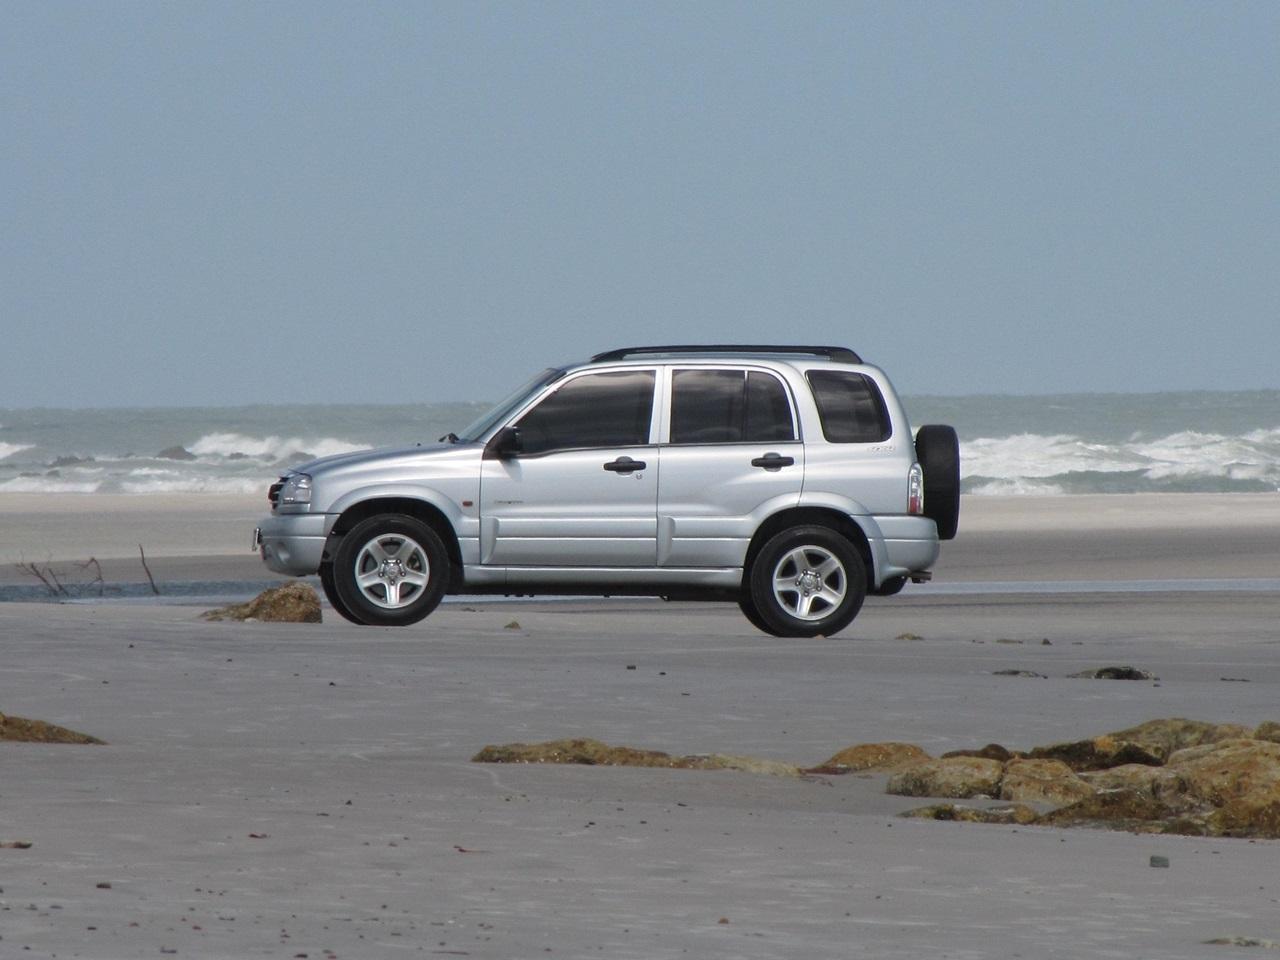 Carro na praia